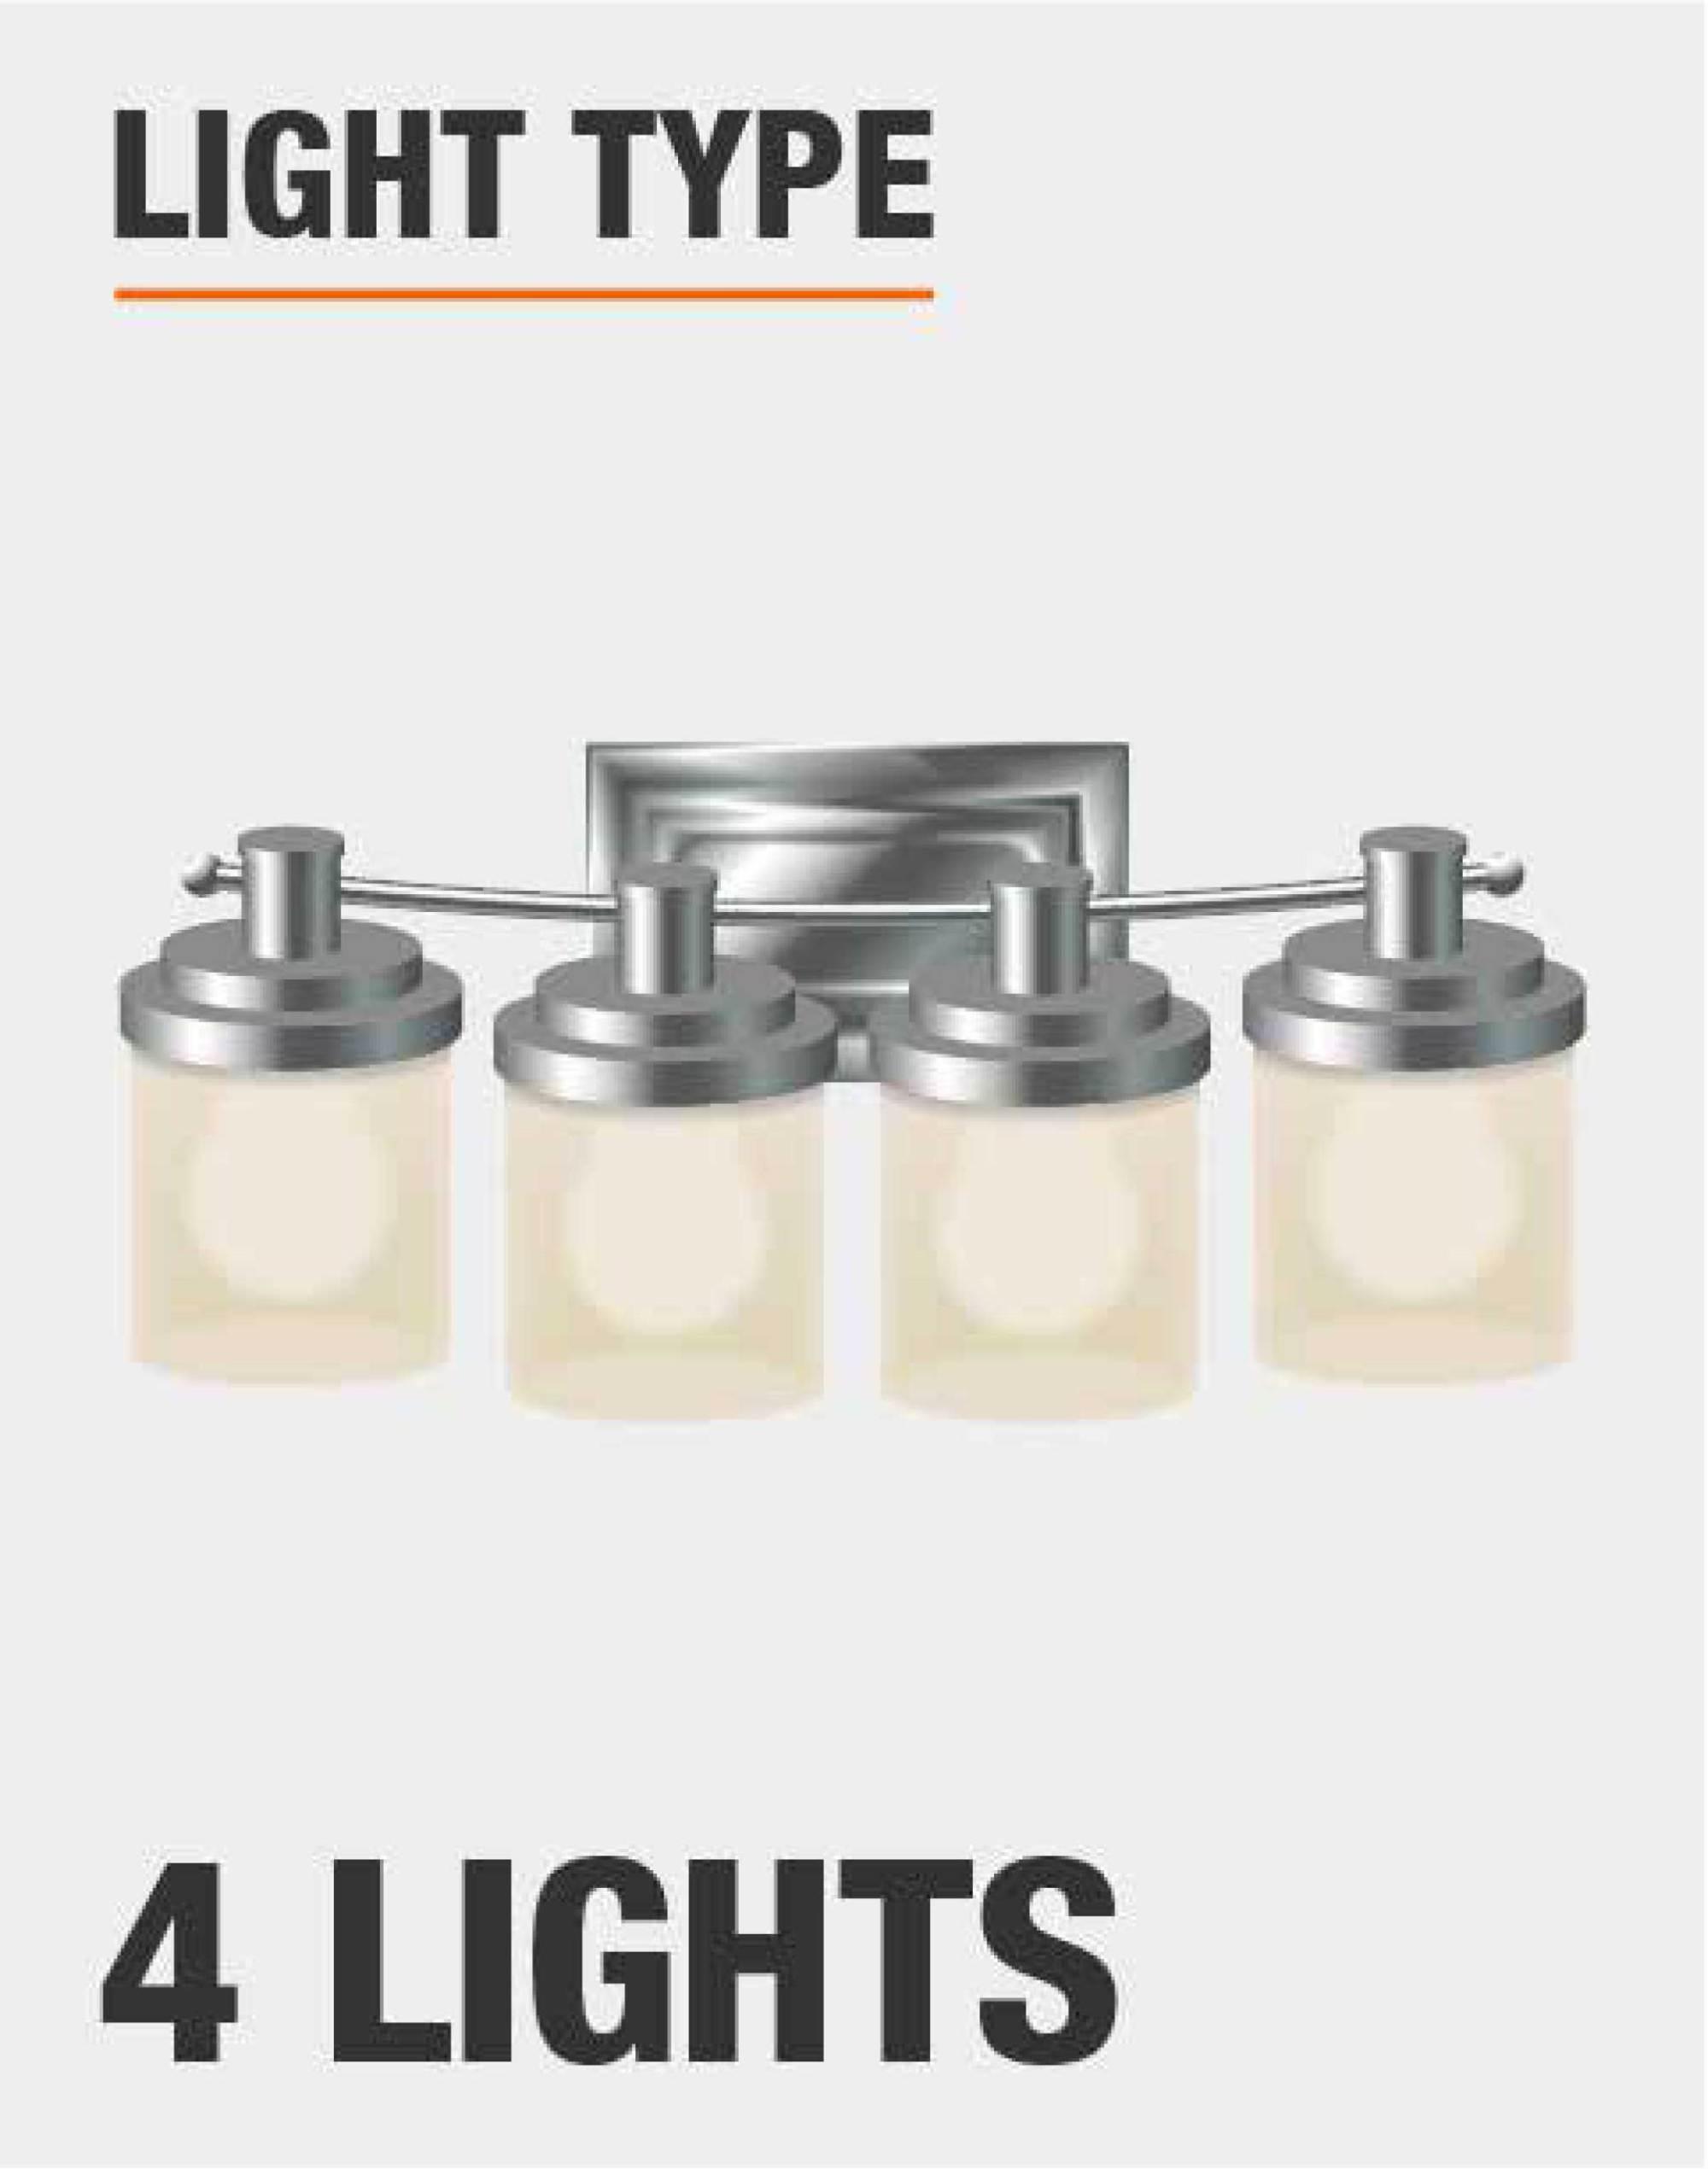 hight resolution of uses 4 100 watt medium base bulbs not included